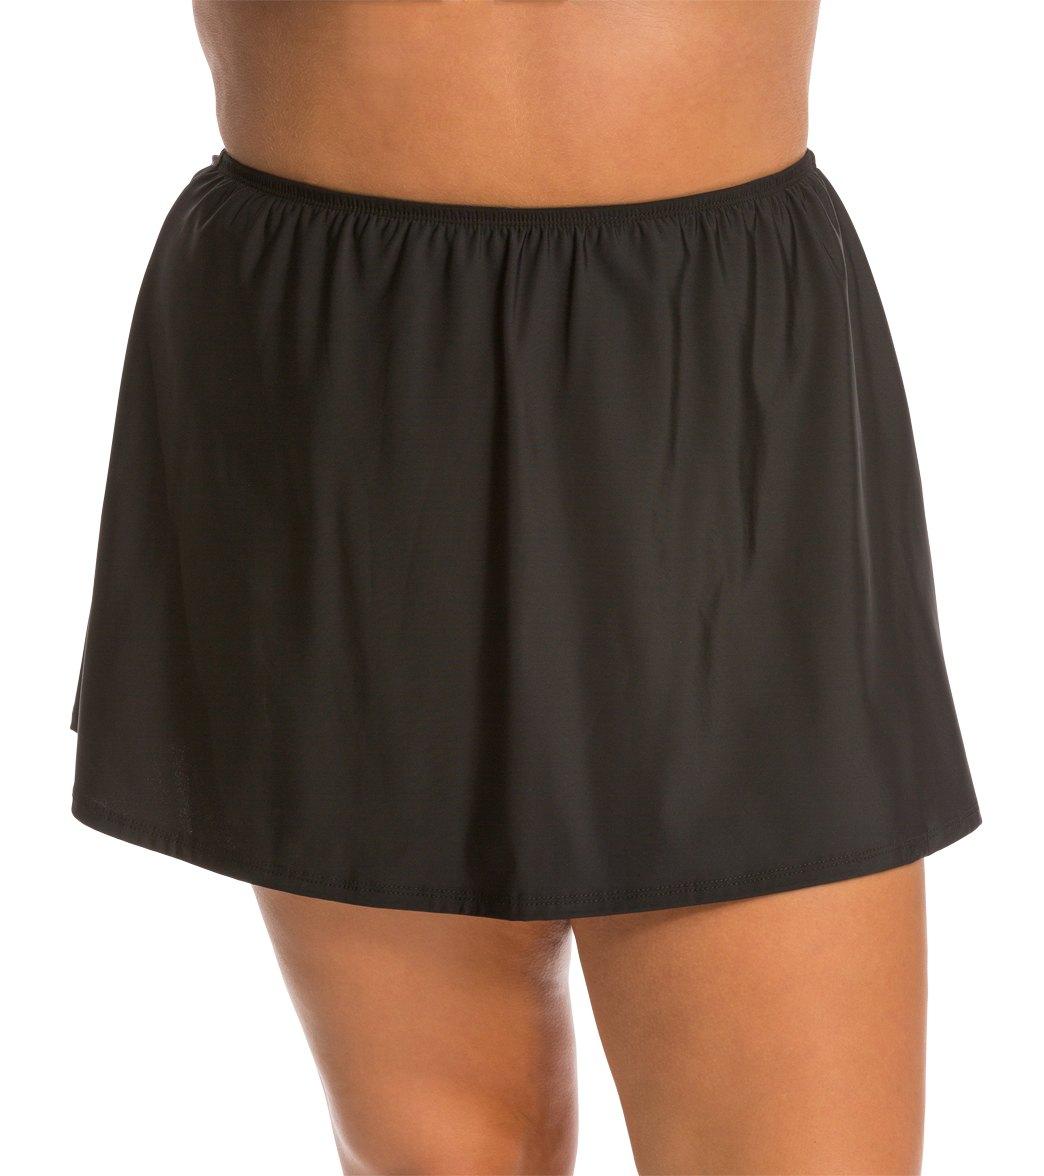 Topanga Plus Solid Swim Skirt